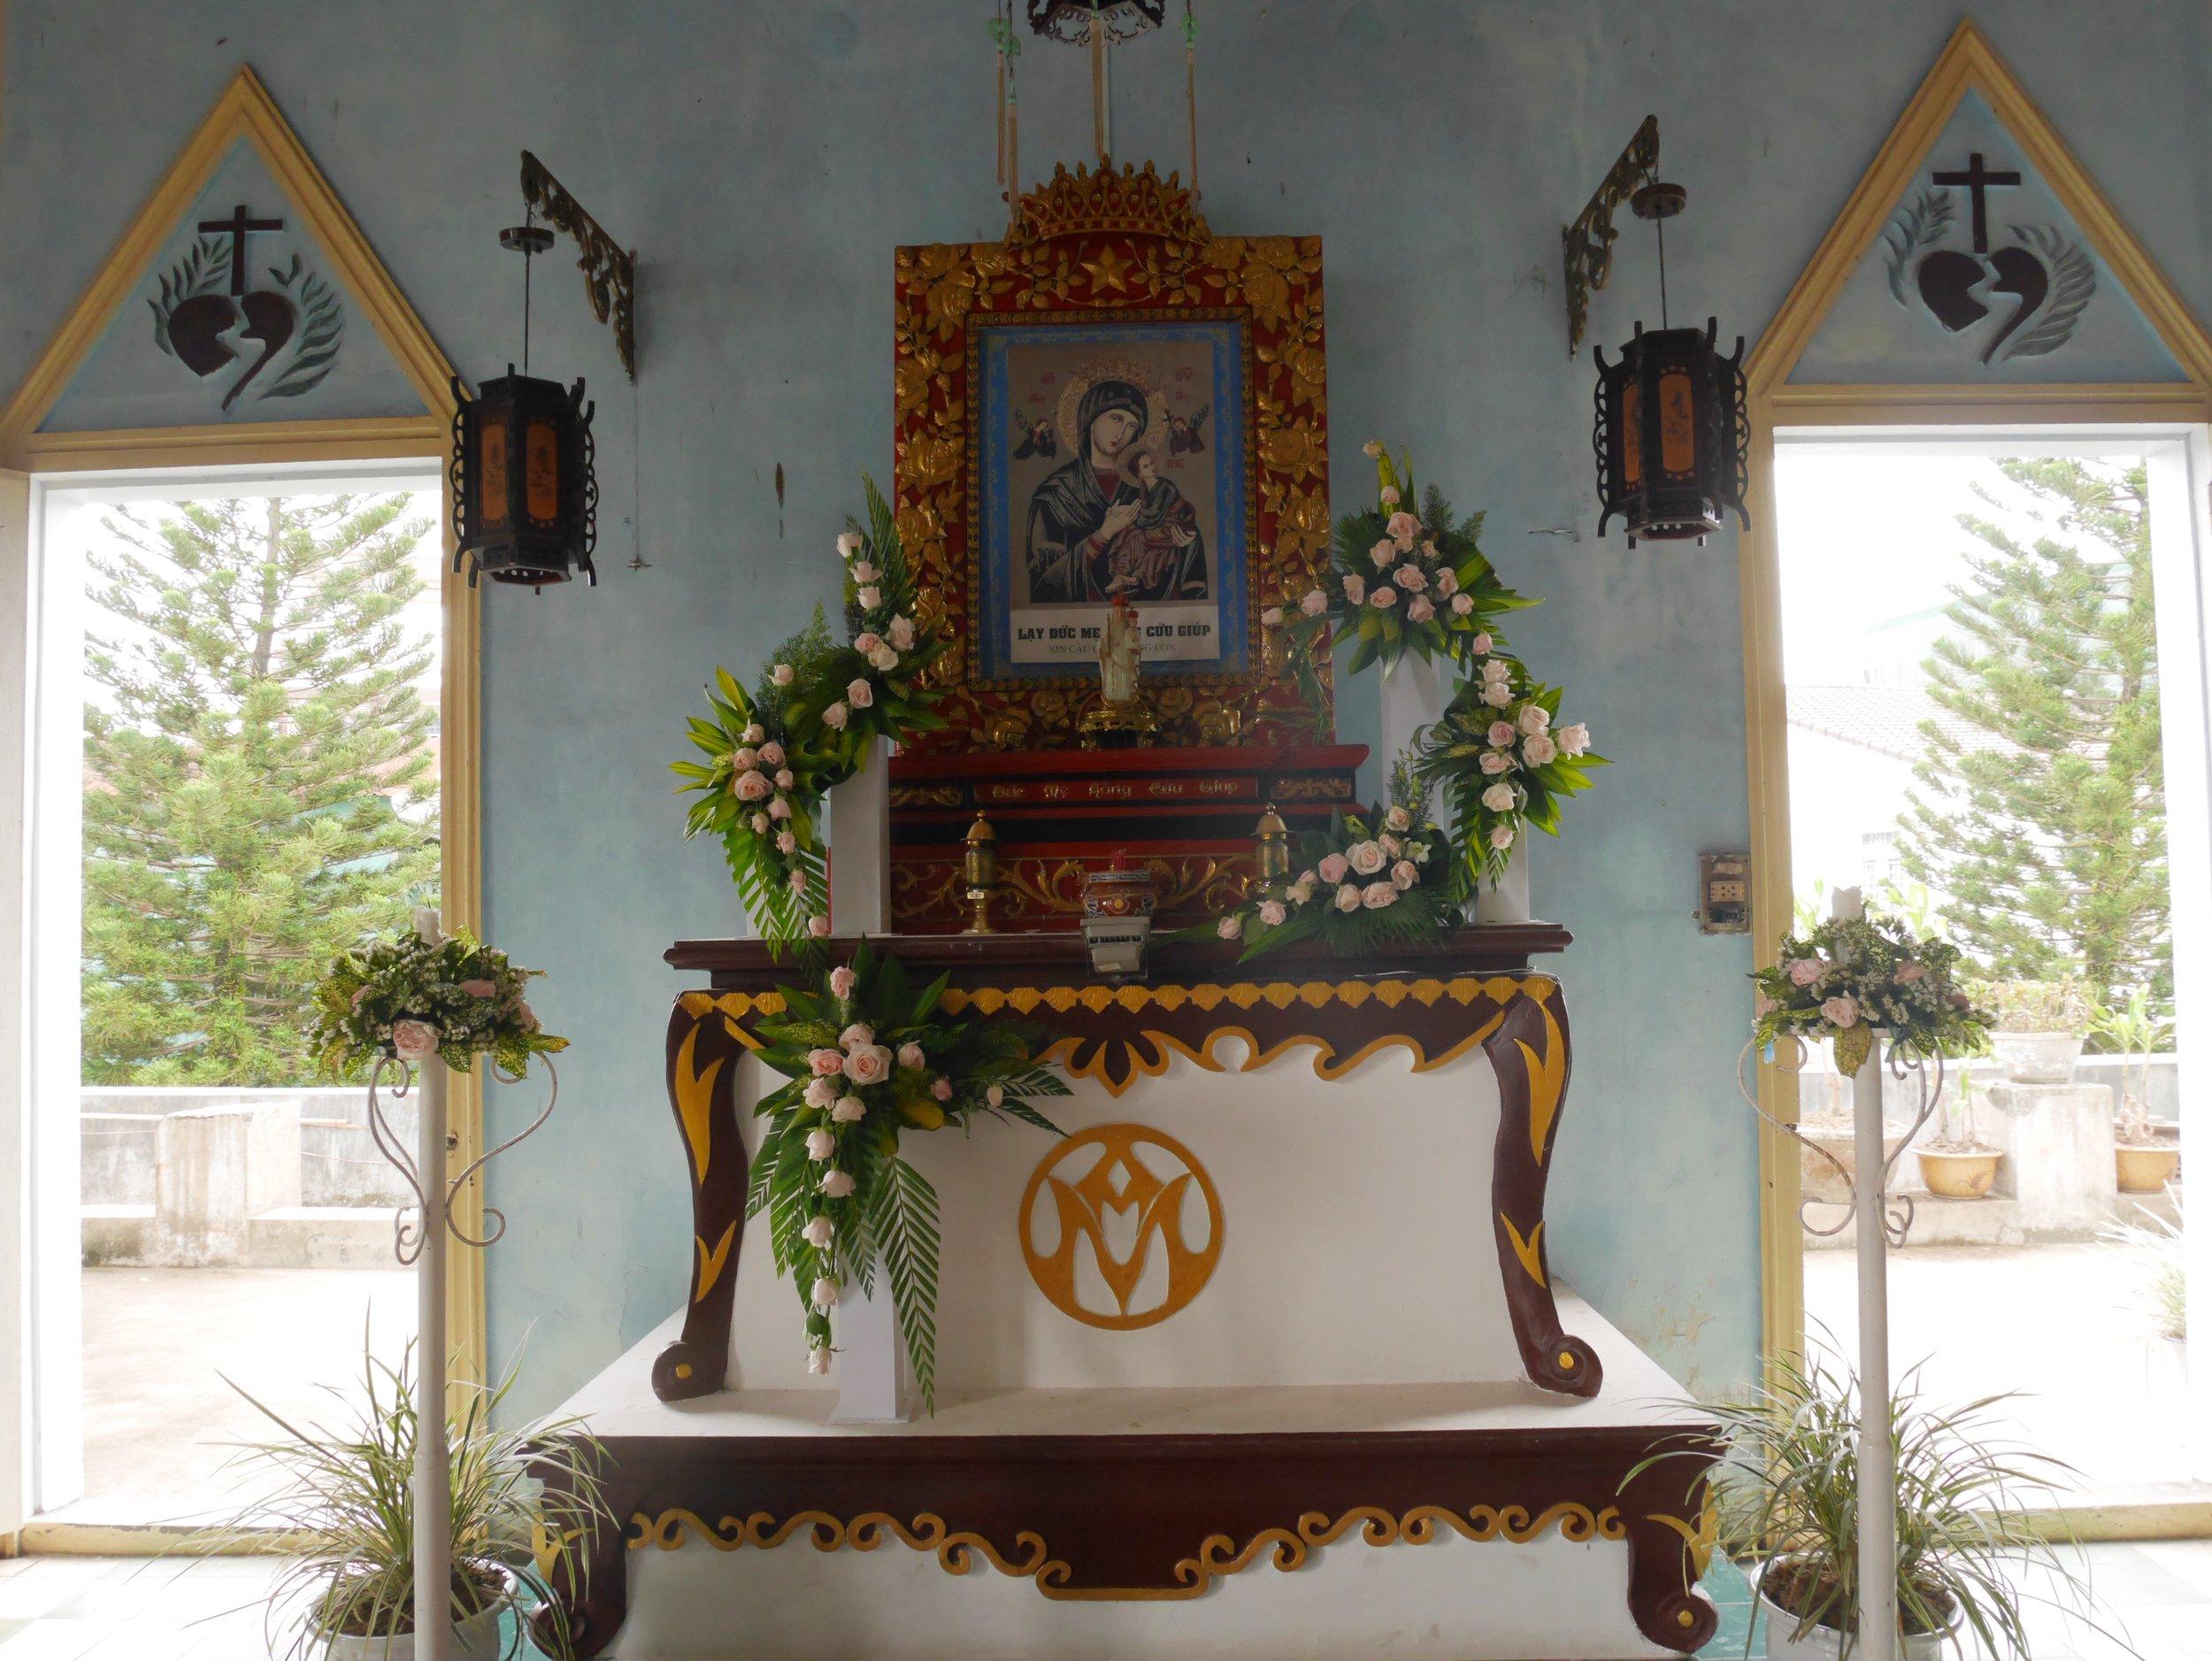 a local church in Hue, Vietnam